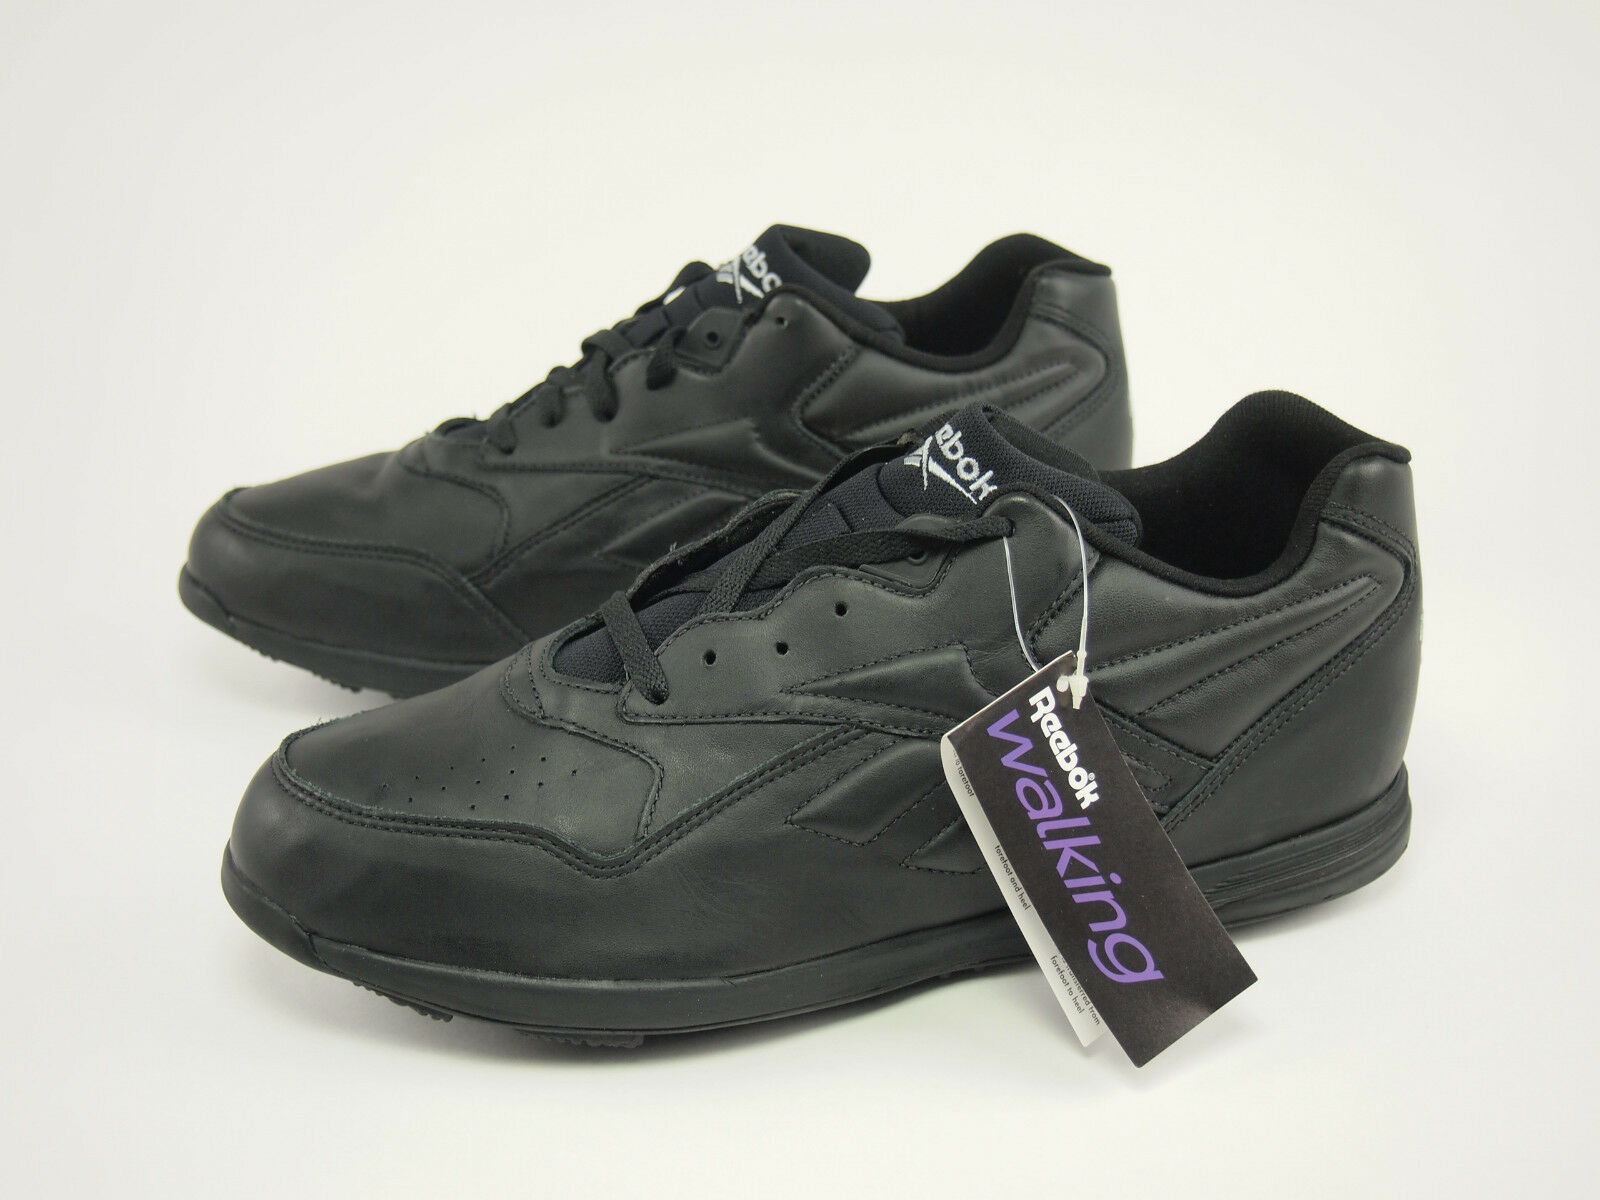 New 1990s REEBOK Vintage nero Leather Walking Walking Walking scarpe da ginnastica scarpe 47 - US 13 36521a